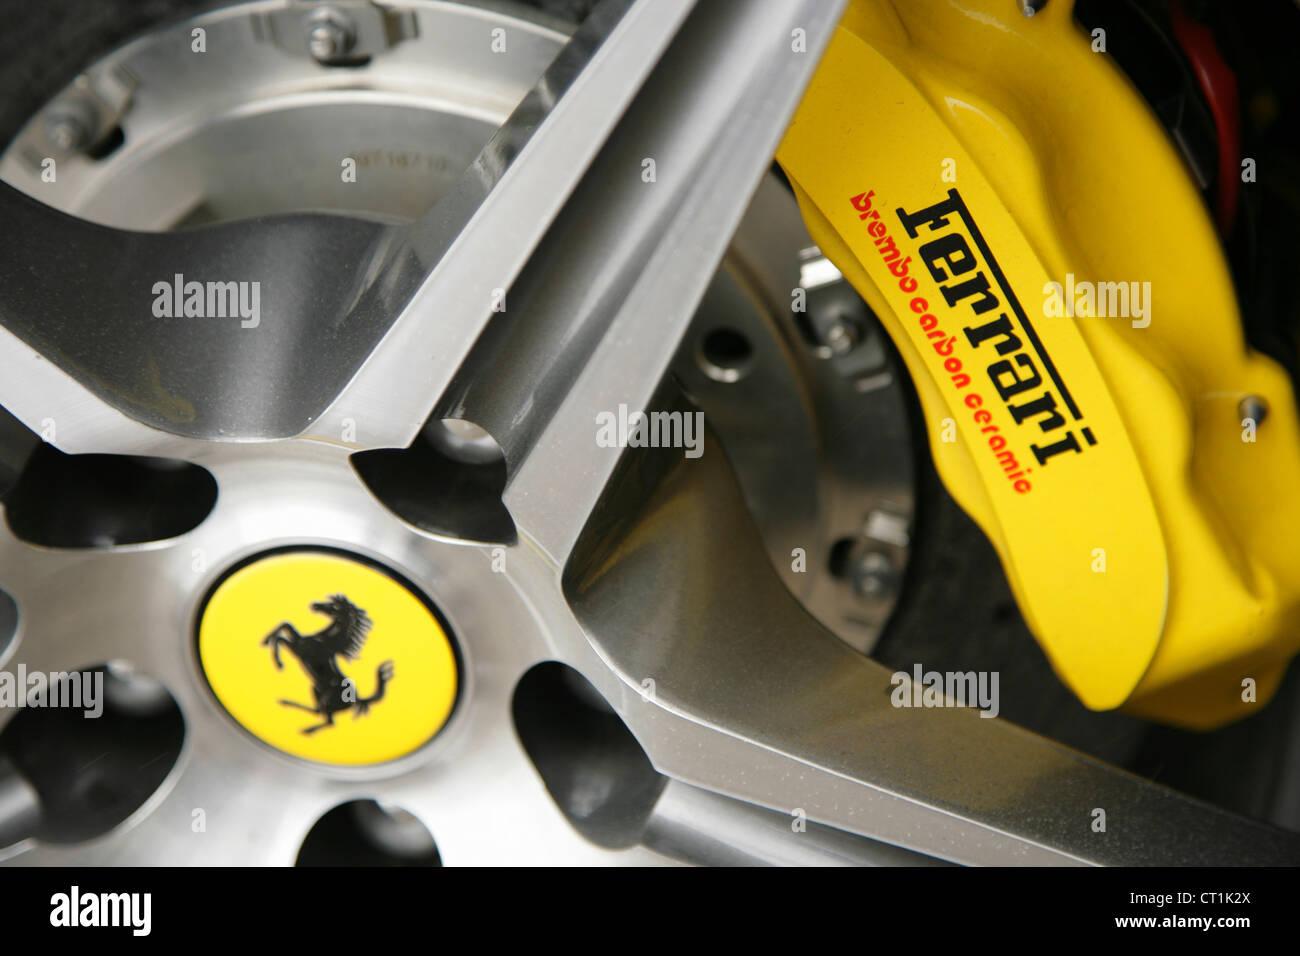 Yellow Brembo brake calipers on Ferrari sportscar Stock